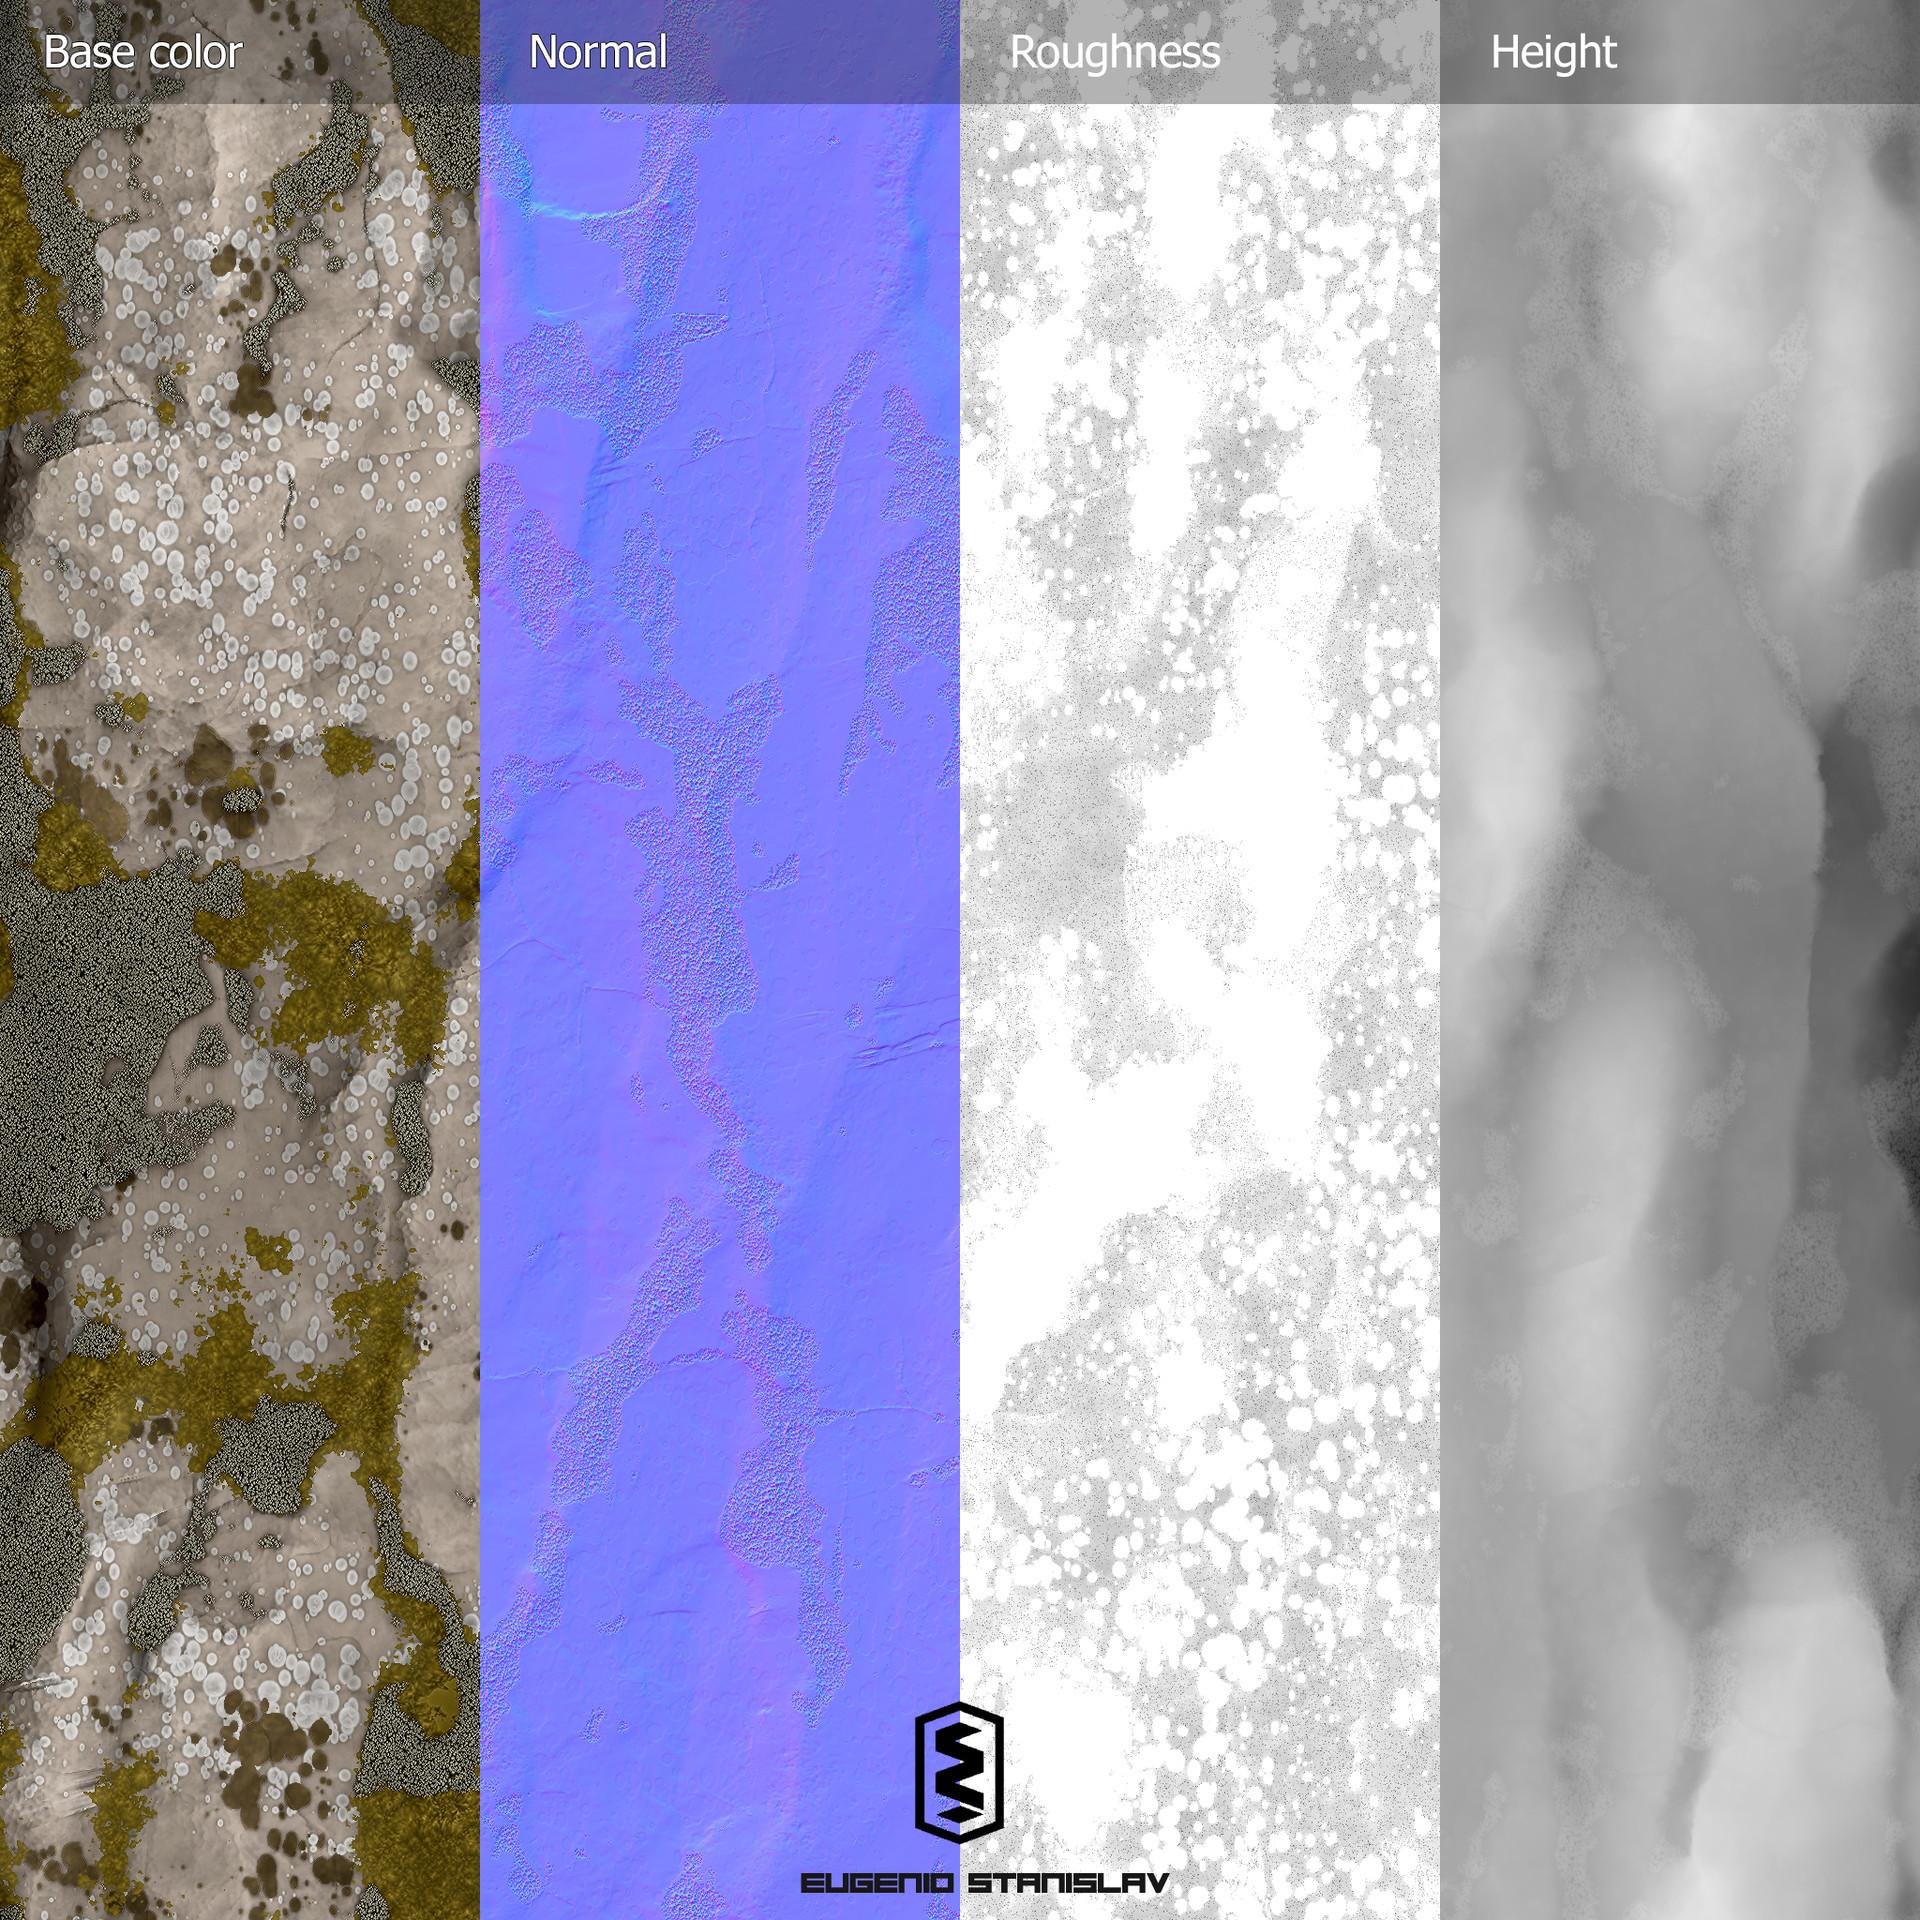 Eugenio stanislav forest rock maps